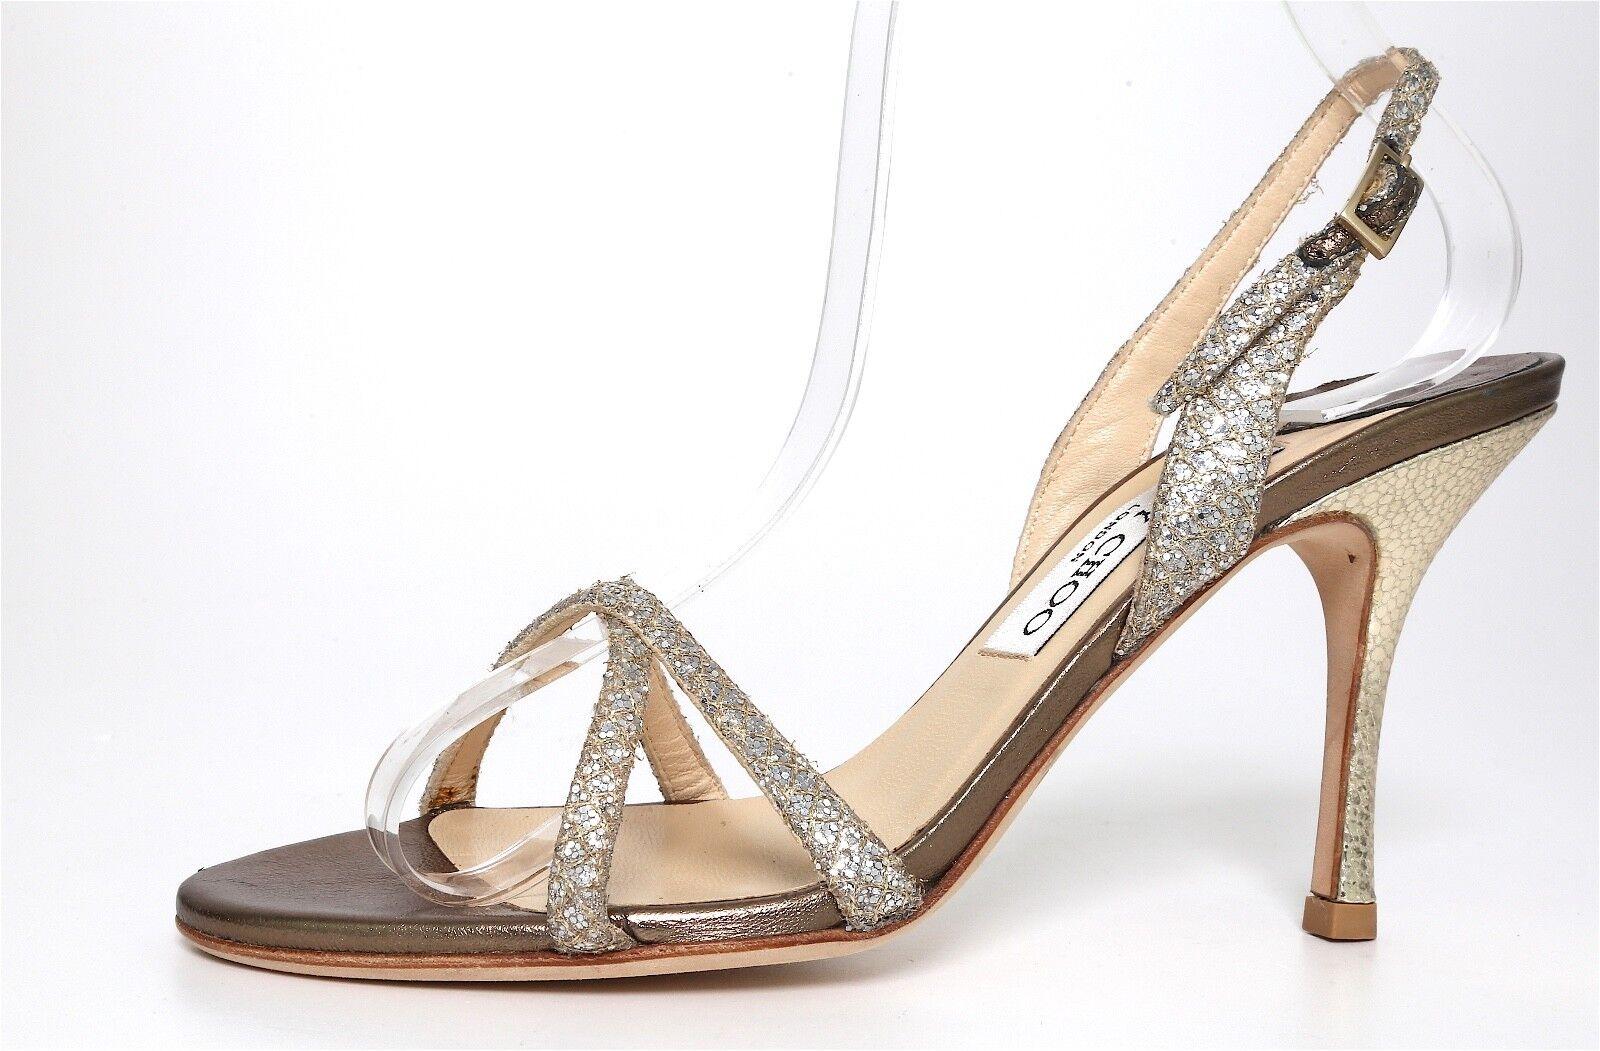 Jimmy Choo Ingrid Coated Leather Glitter Sandals Metallic Women Sz 36.5 EUR 5116